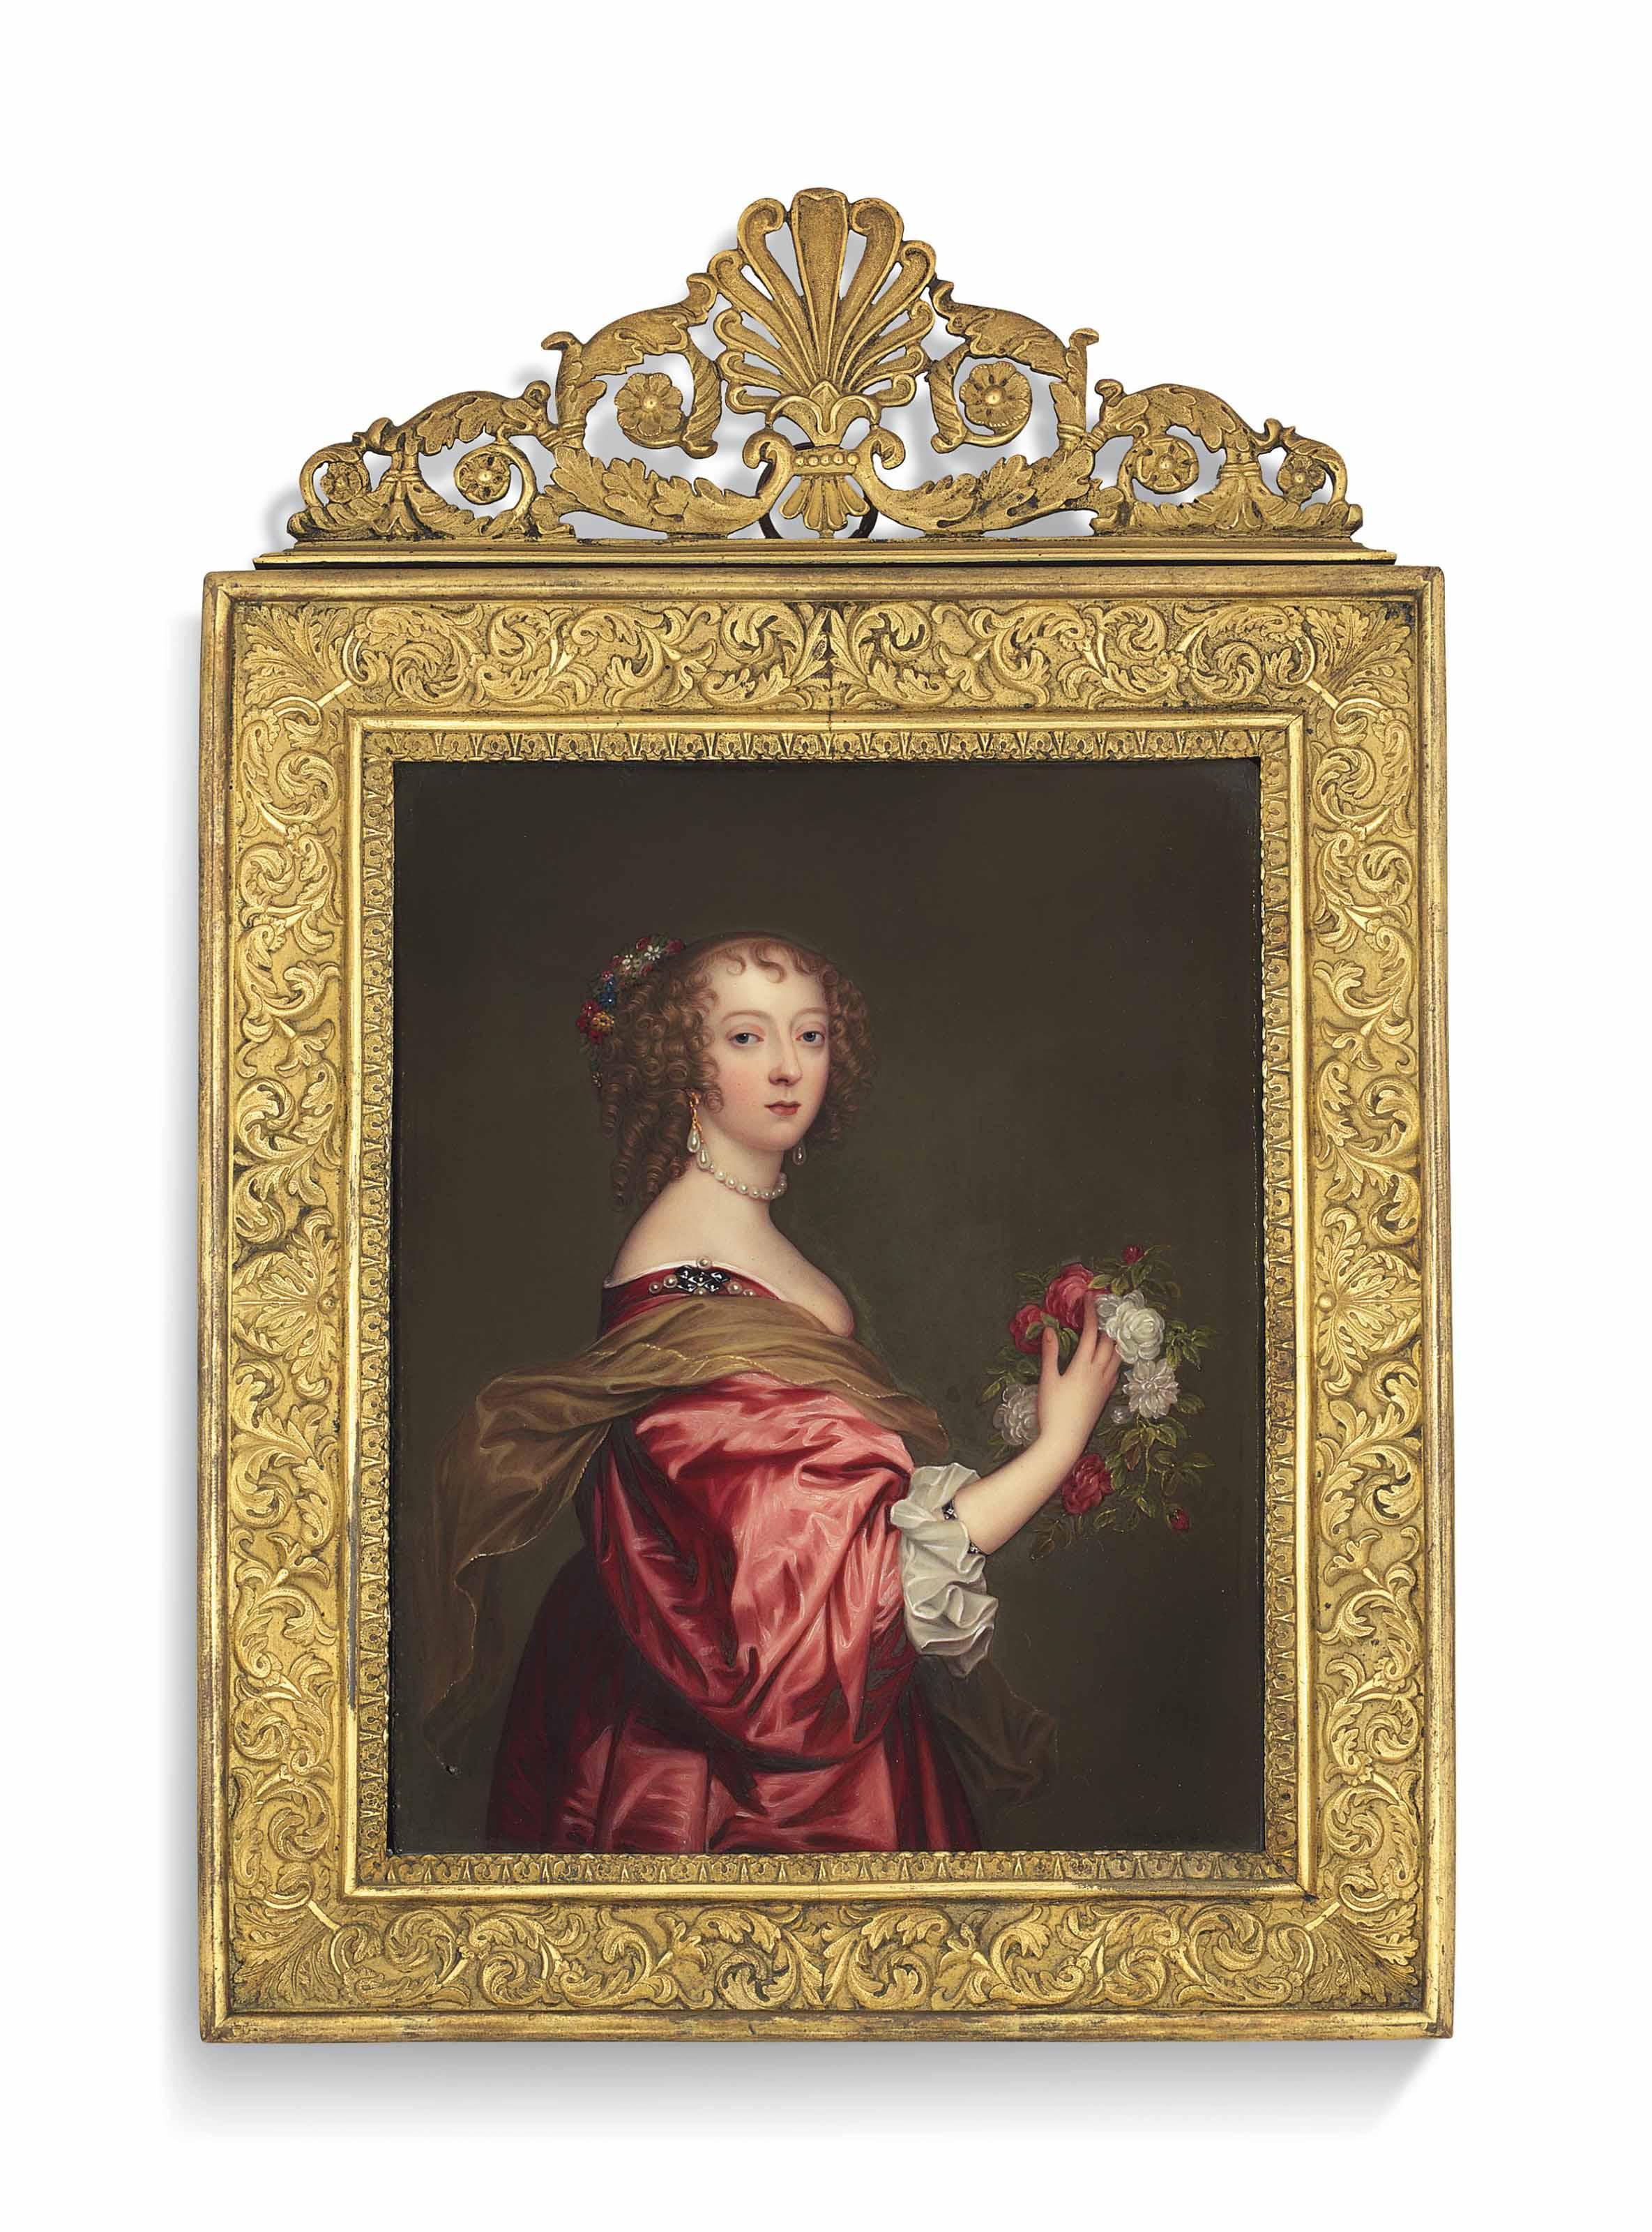 HENRY BONE, R.A. (BRITISH, 1755-1834) AFTER SIR ANTHONY VAN DYCK (FLEMISH, 1599-1641)